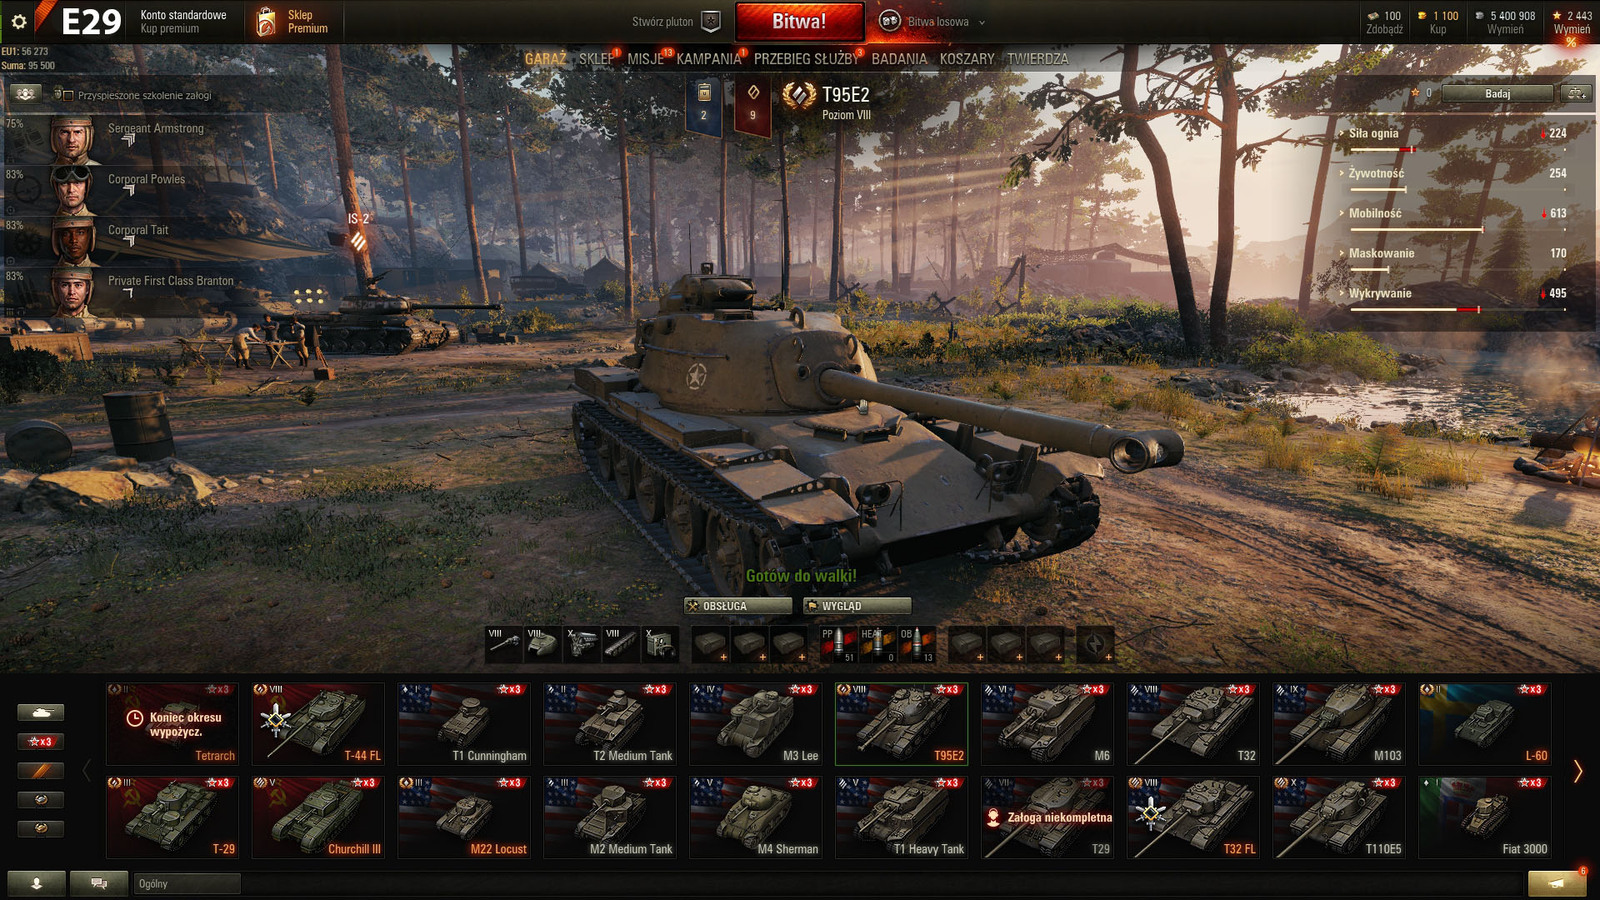 World of tanks account E29 T110E5 full line, and 17 similar items